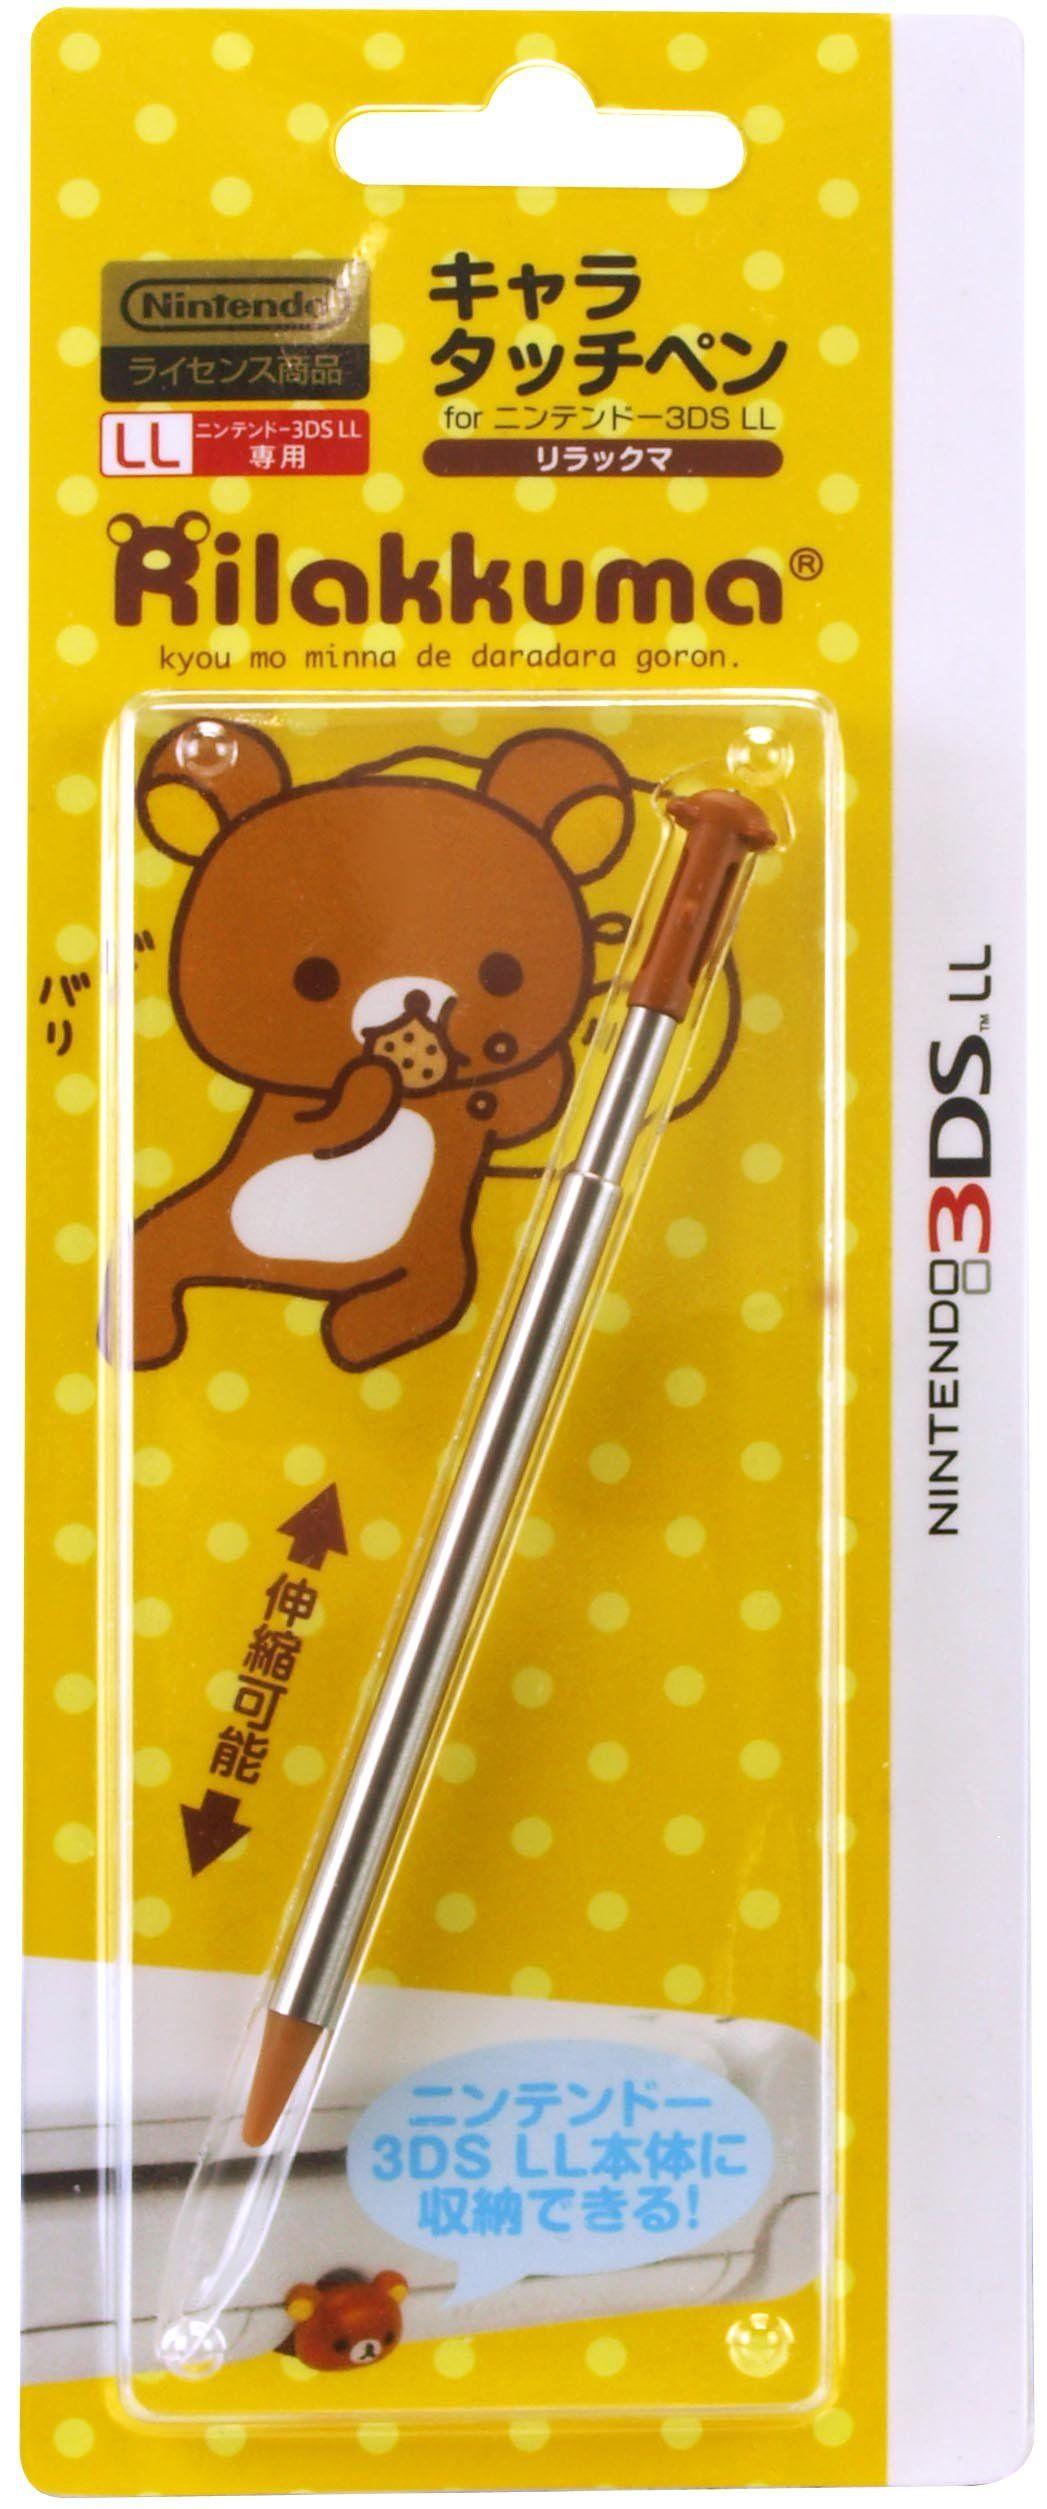 Nintendo Official Kawaii 3ds Xl Stylus Rilakkuma Video Games Amazon Com Nintendo Nintendo 3ds 3ds